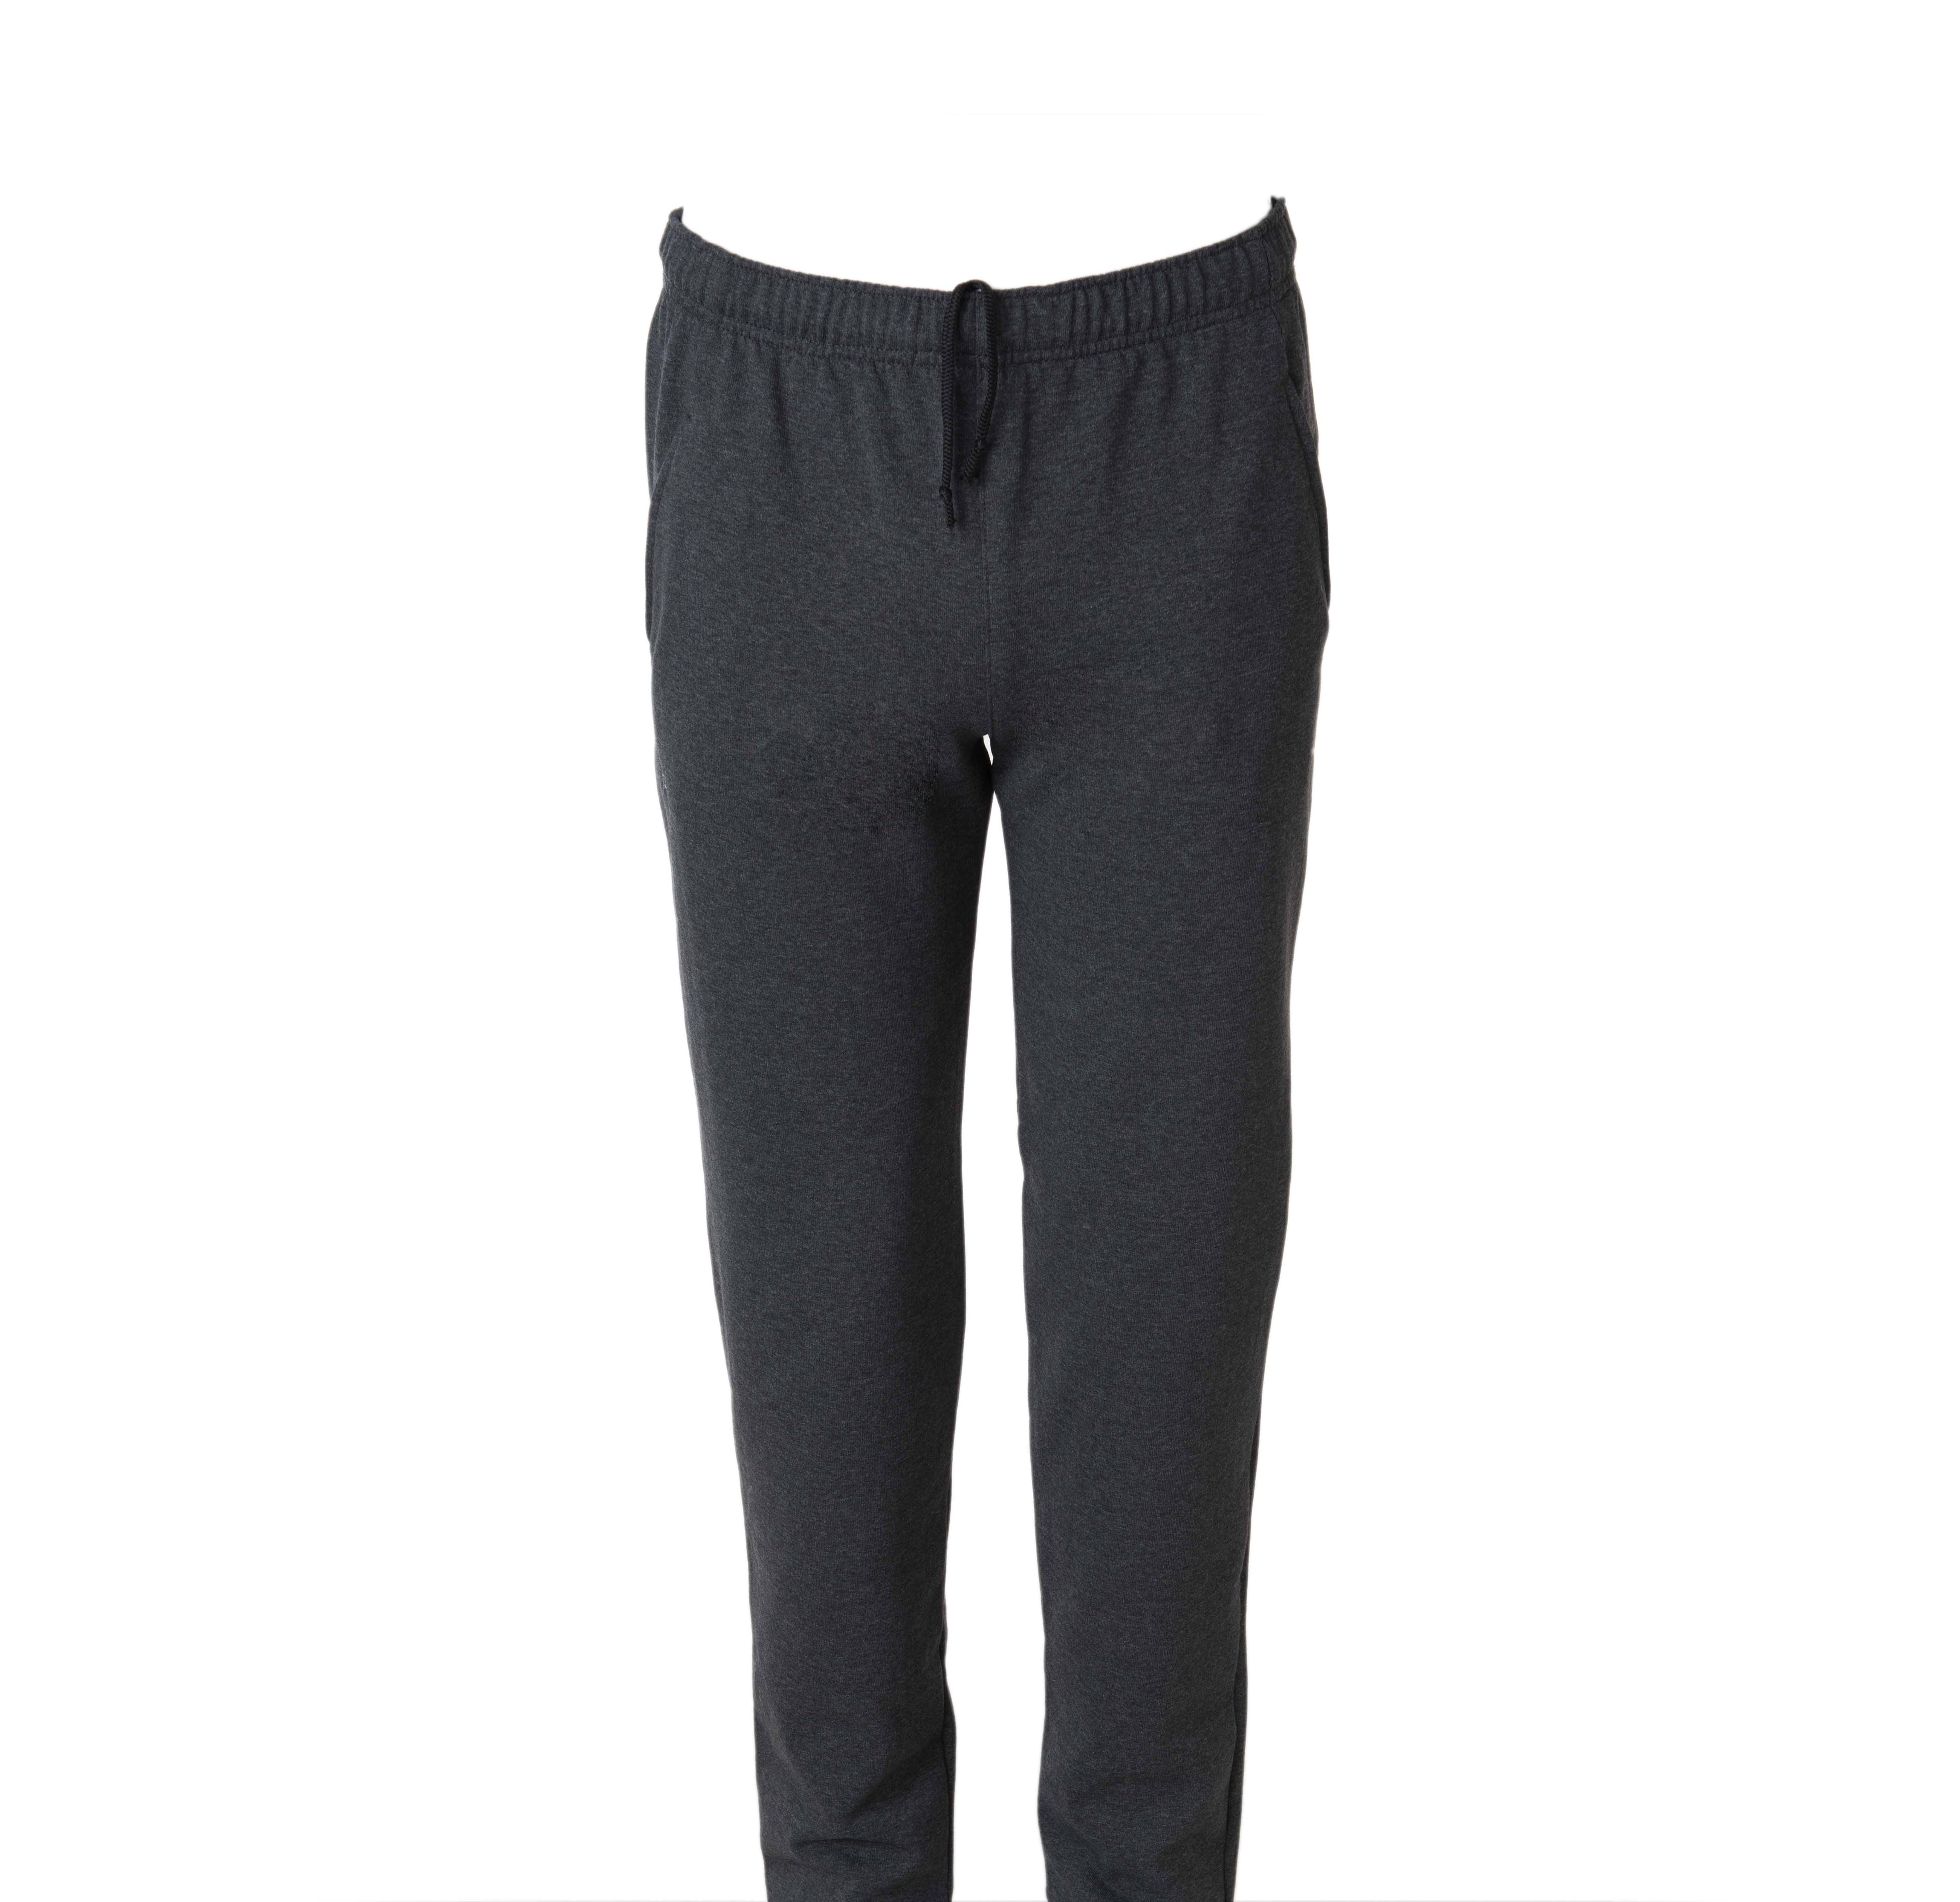 Pantalón chandal con felpa marca BLAPER TALLAS GRANDES P -- 9XL 4eeb202f8983